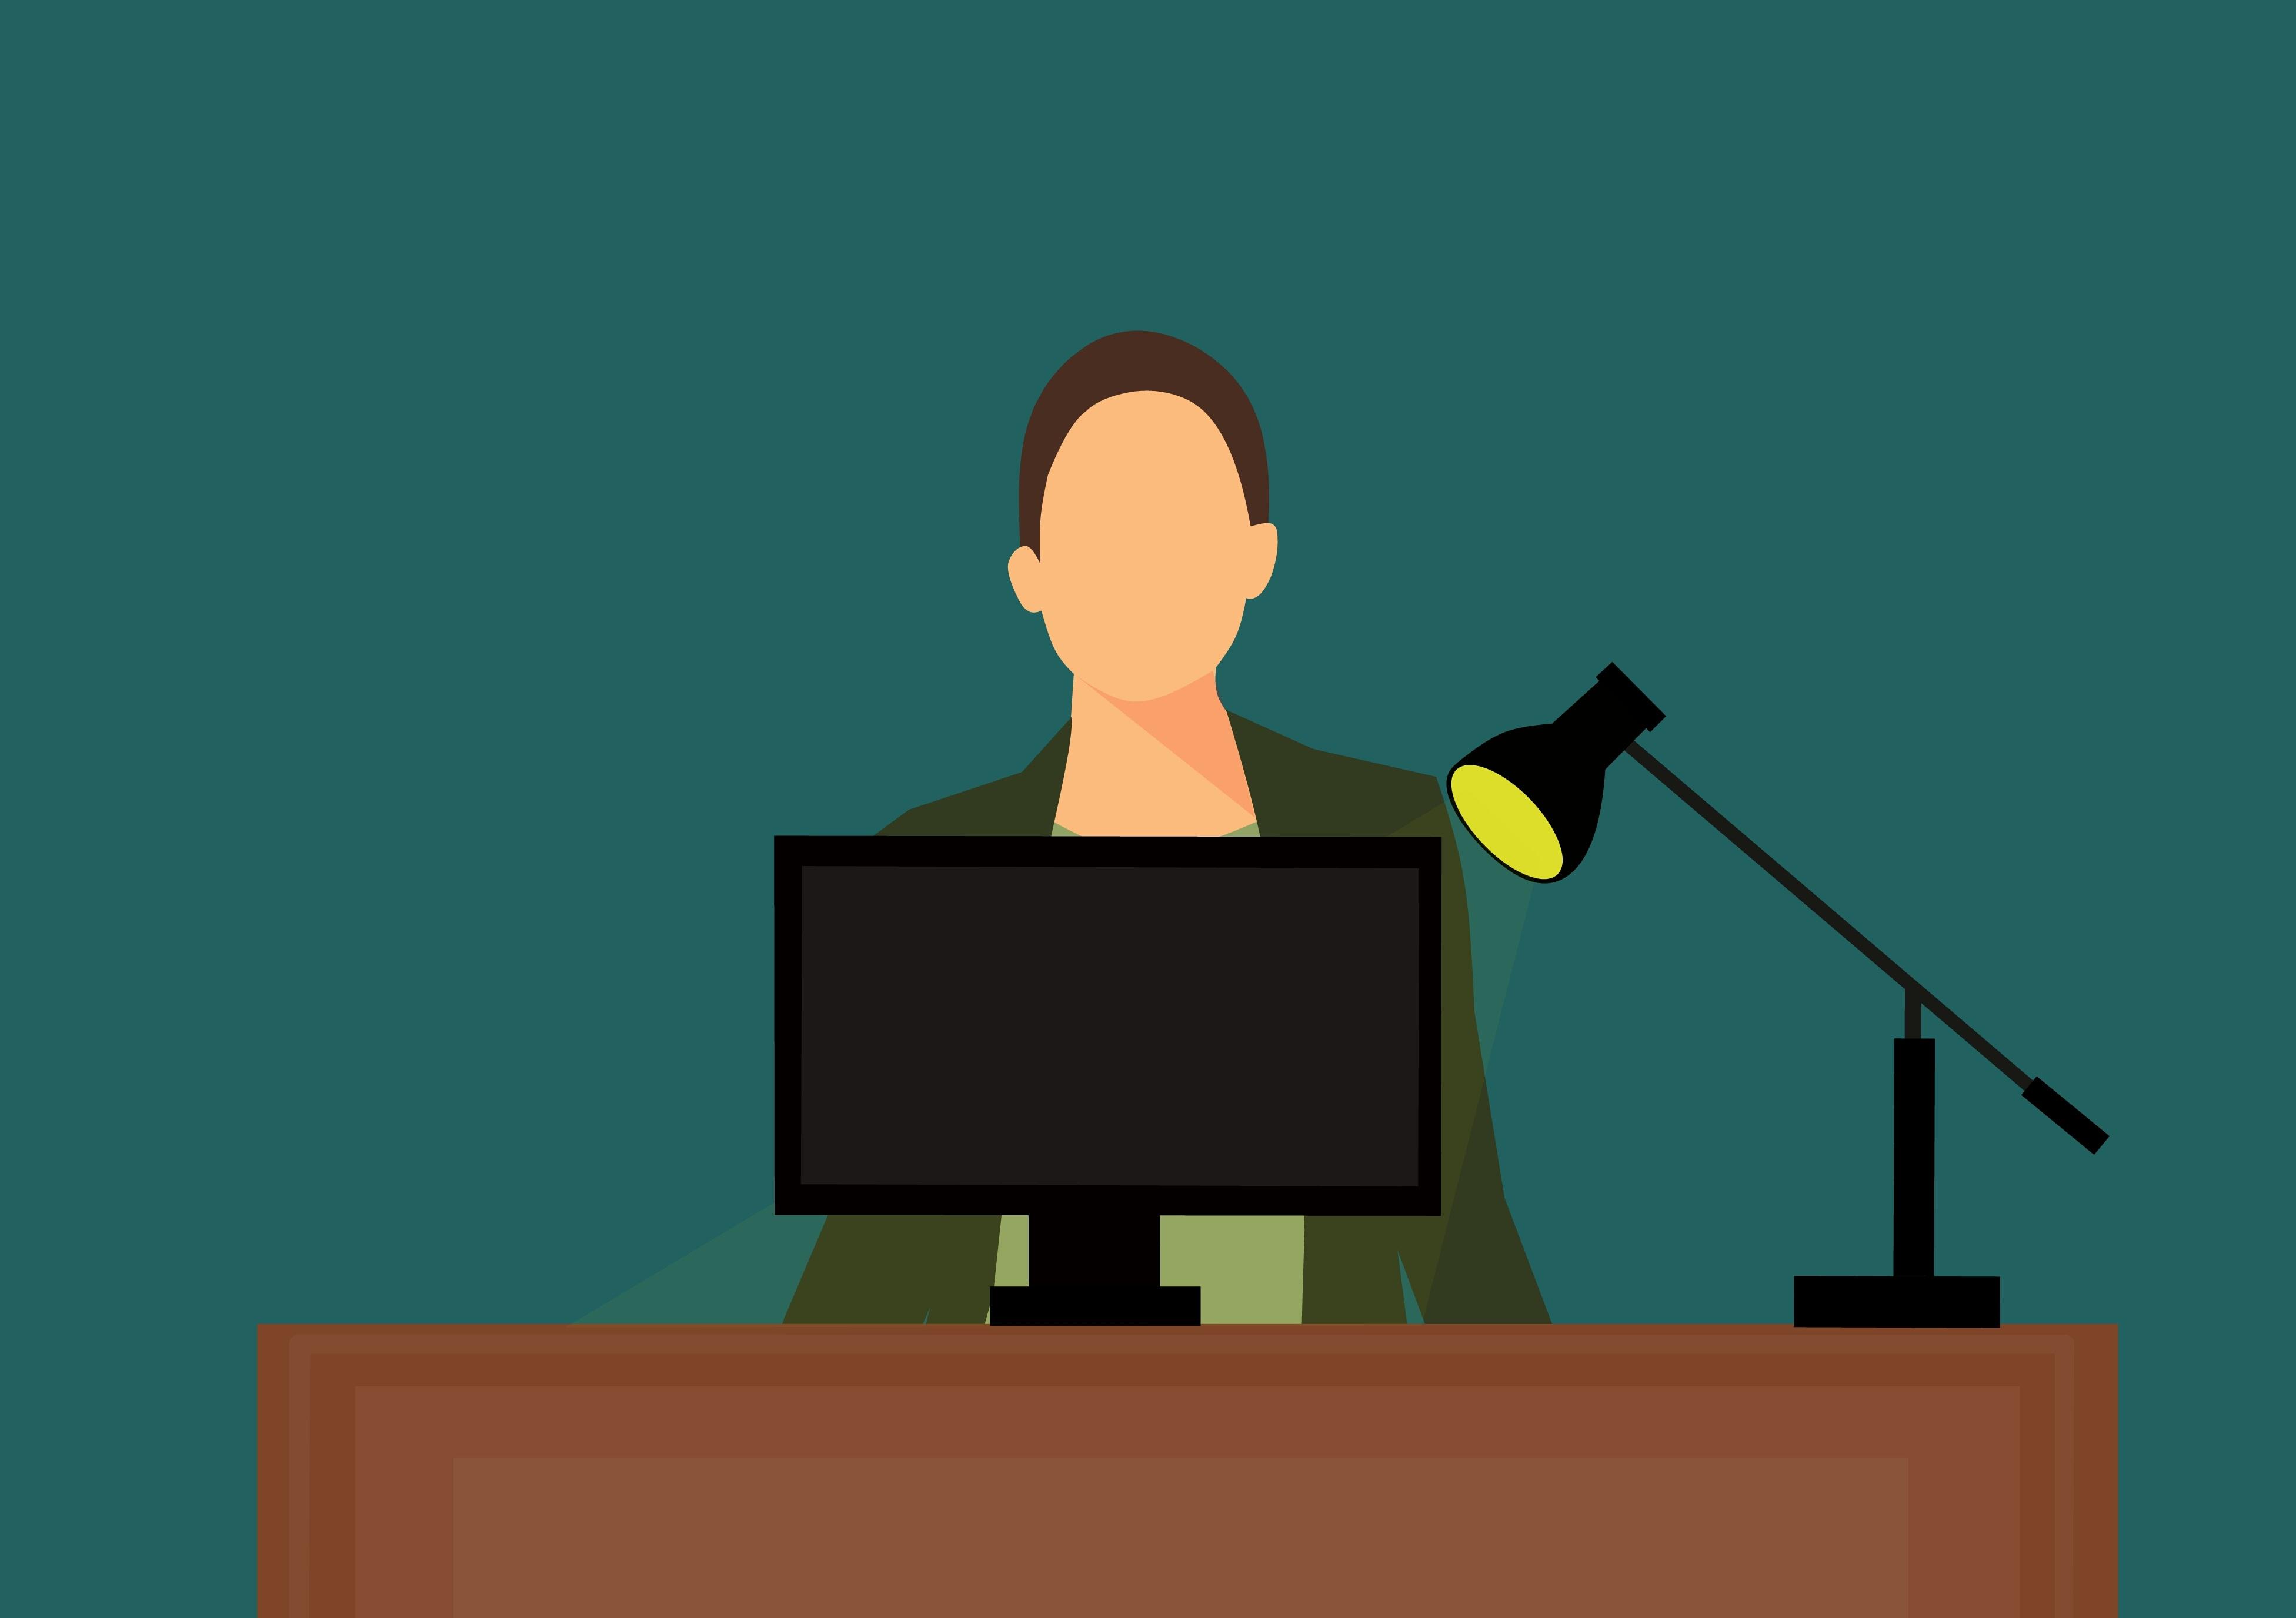 Gambar Layar Komputer Bekerja Pada Komputer Office Computer